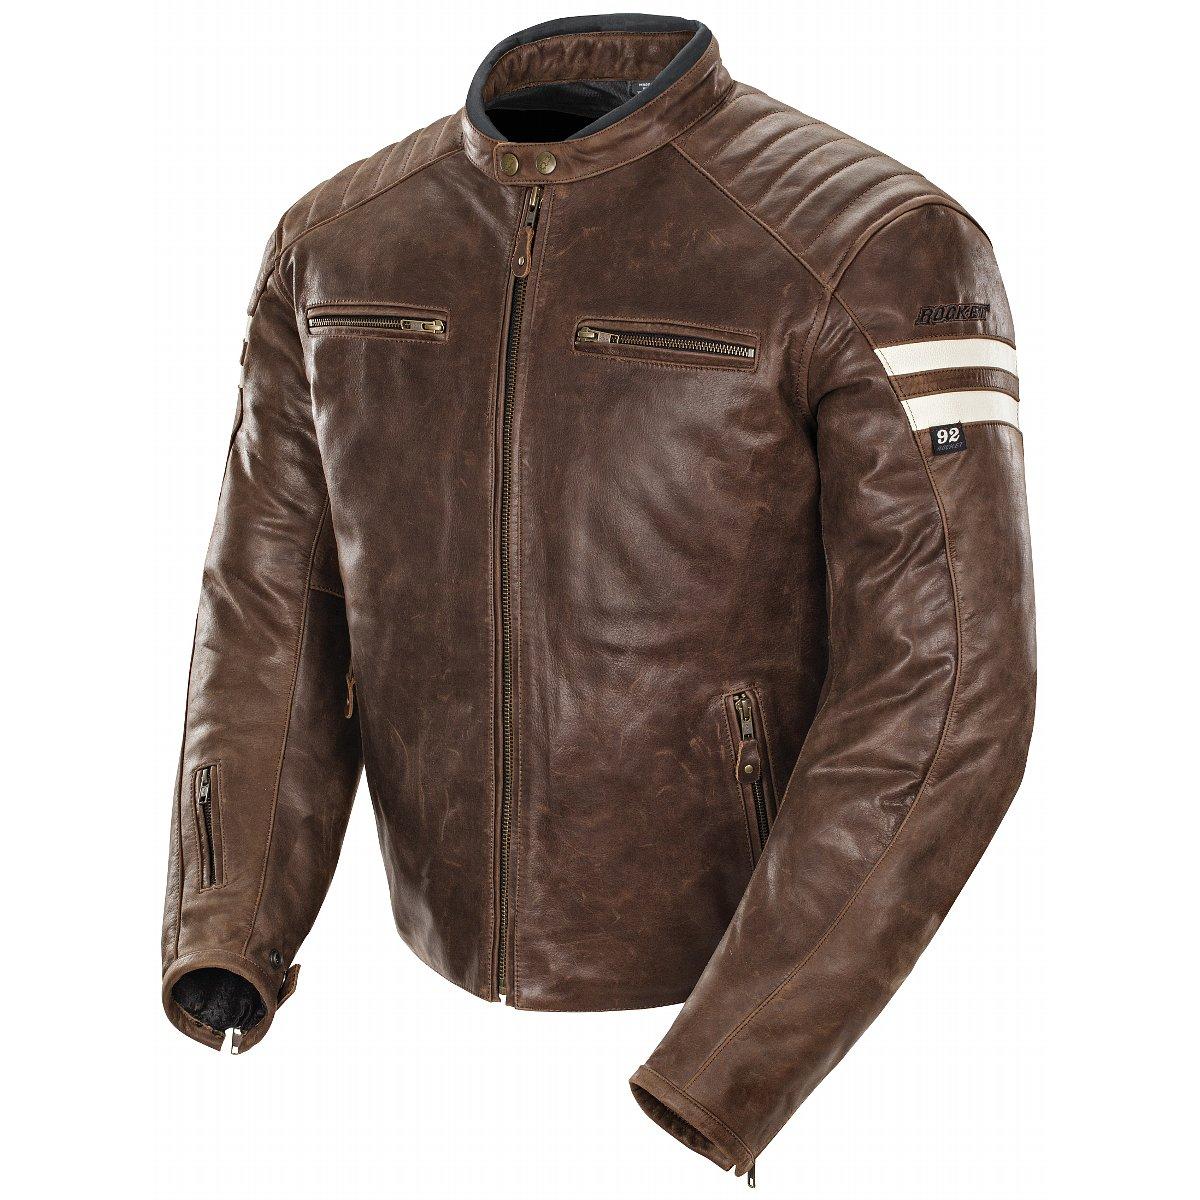 Joe Rocket Classic 92 Mens Brown/Cream Leather Jacket